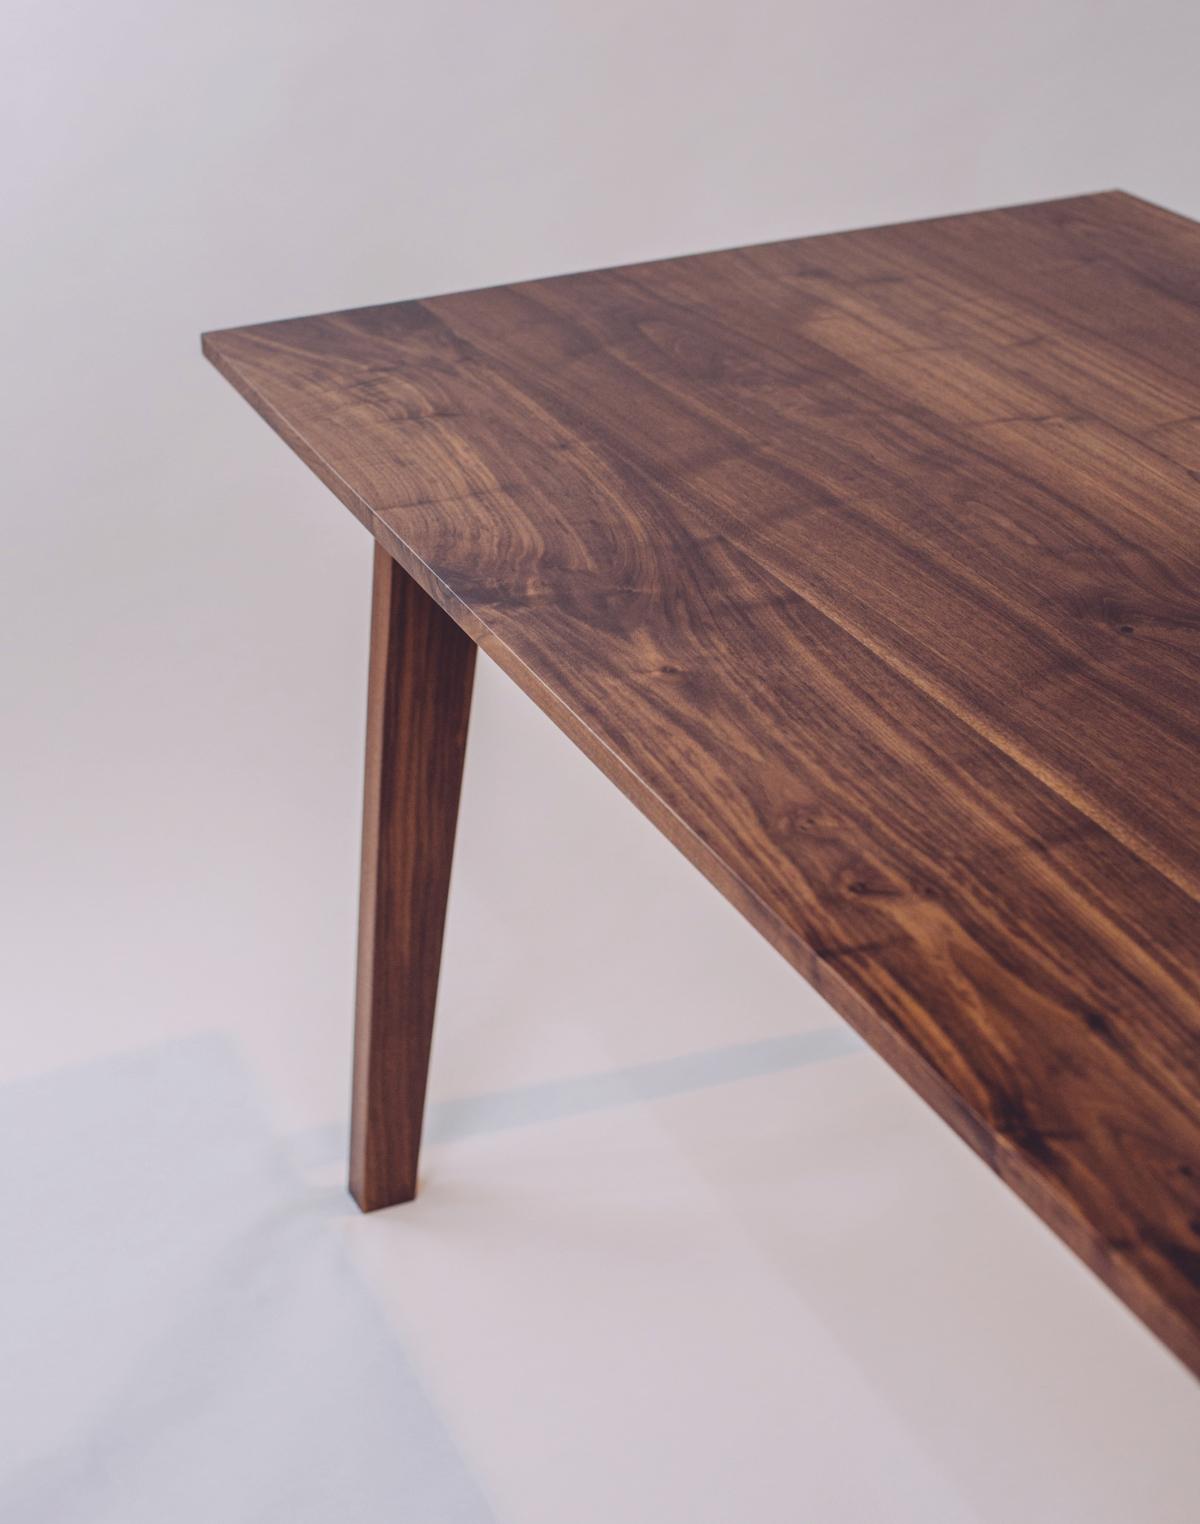 skana table_190619.jpg